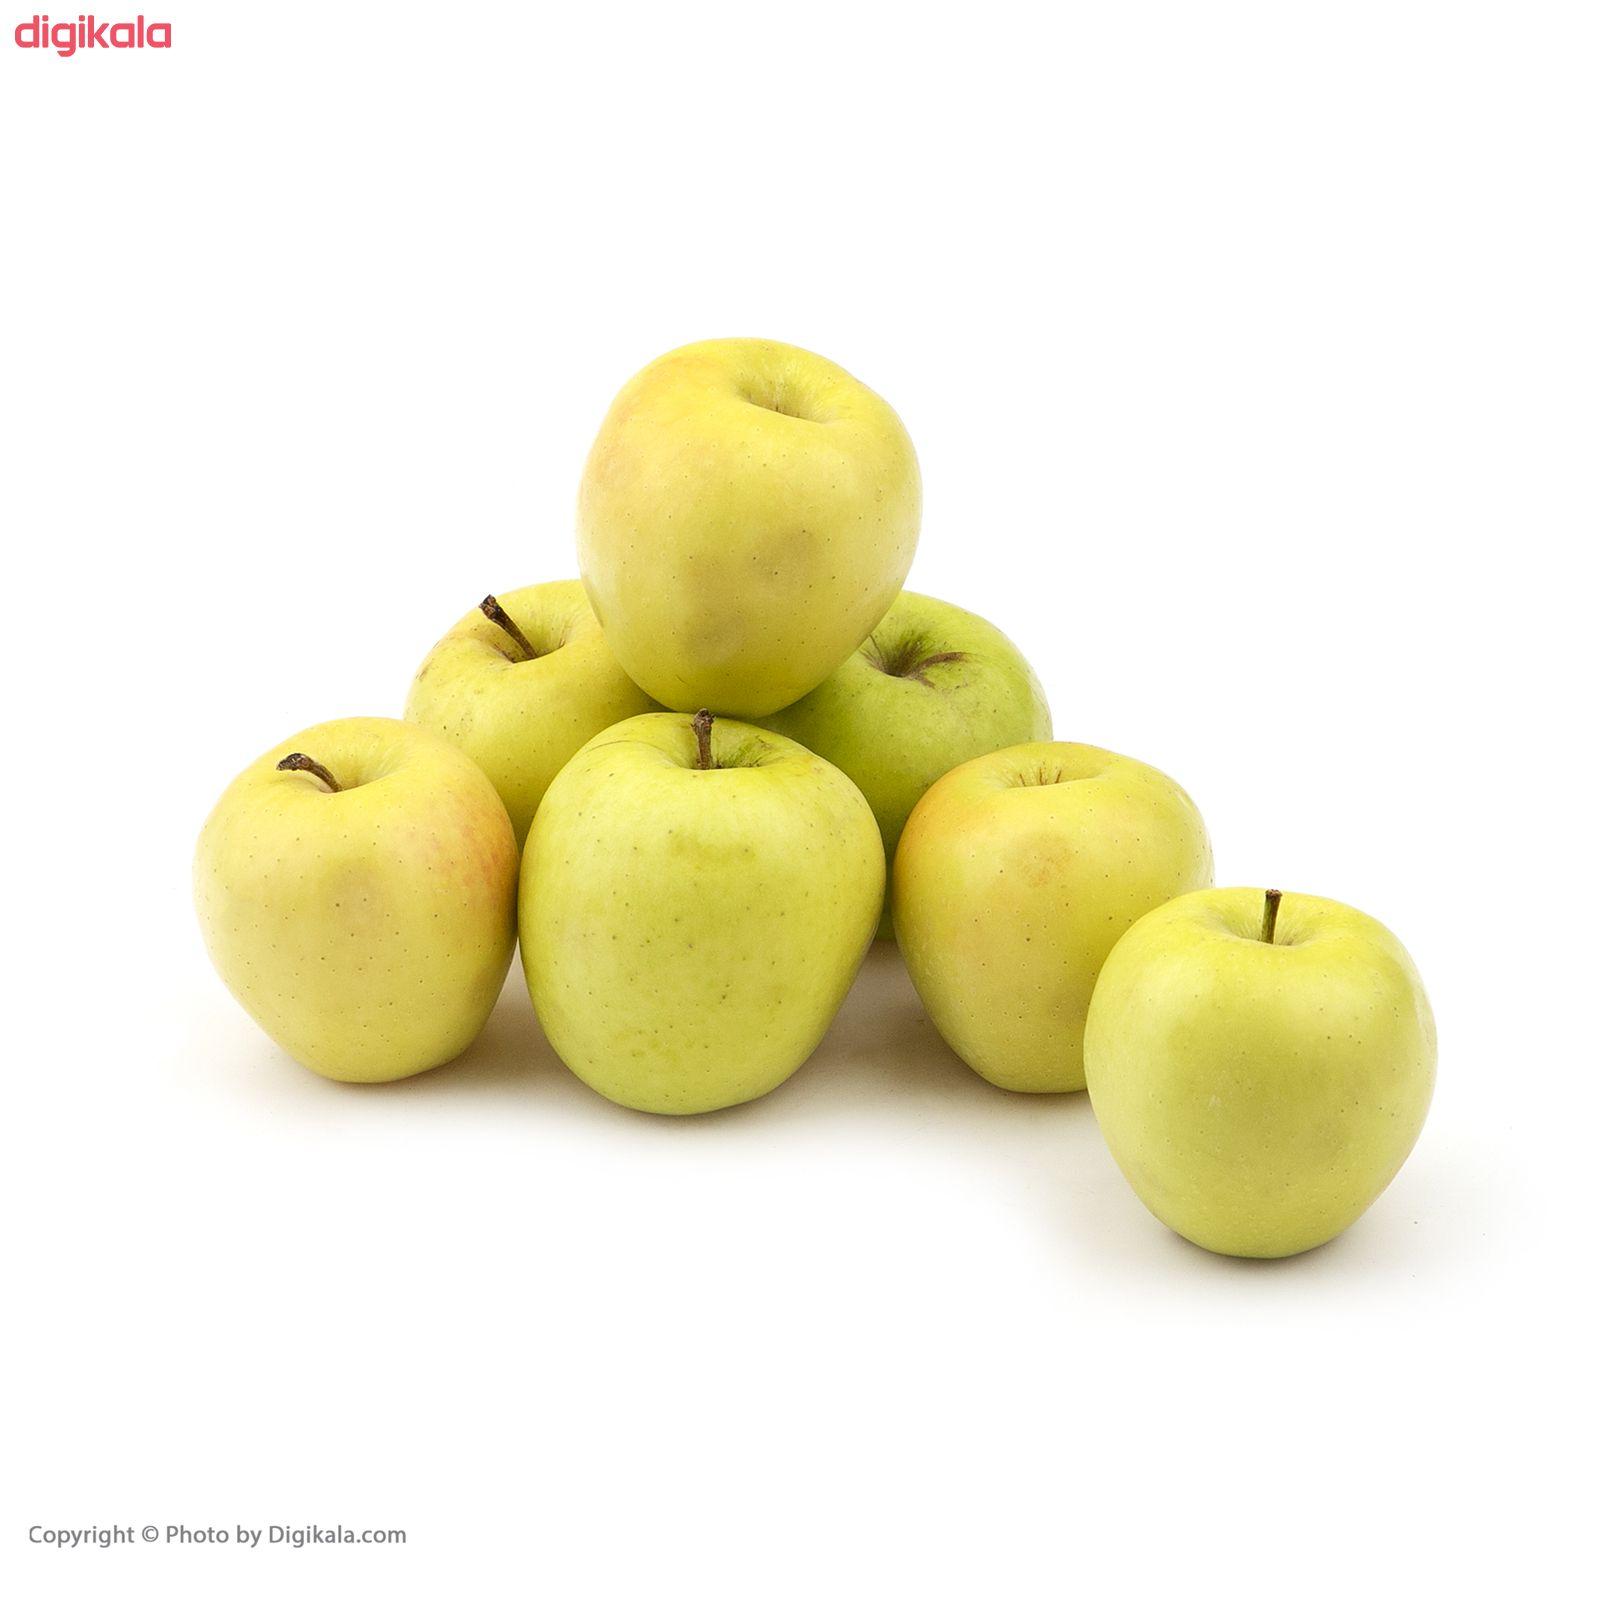 سیب زرد دماوند فله - 1 کیلوگرم main 1 2